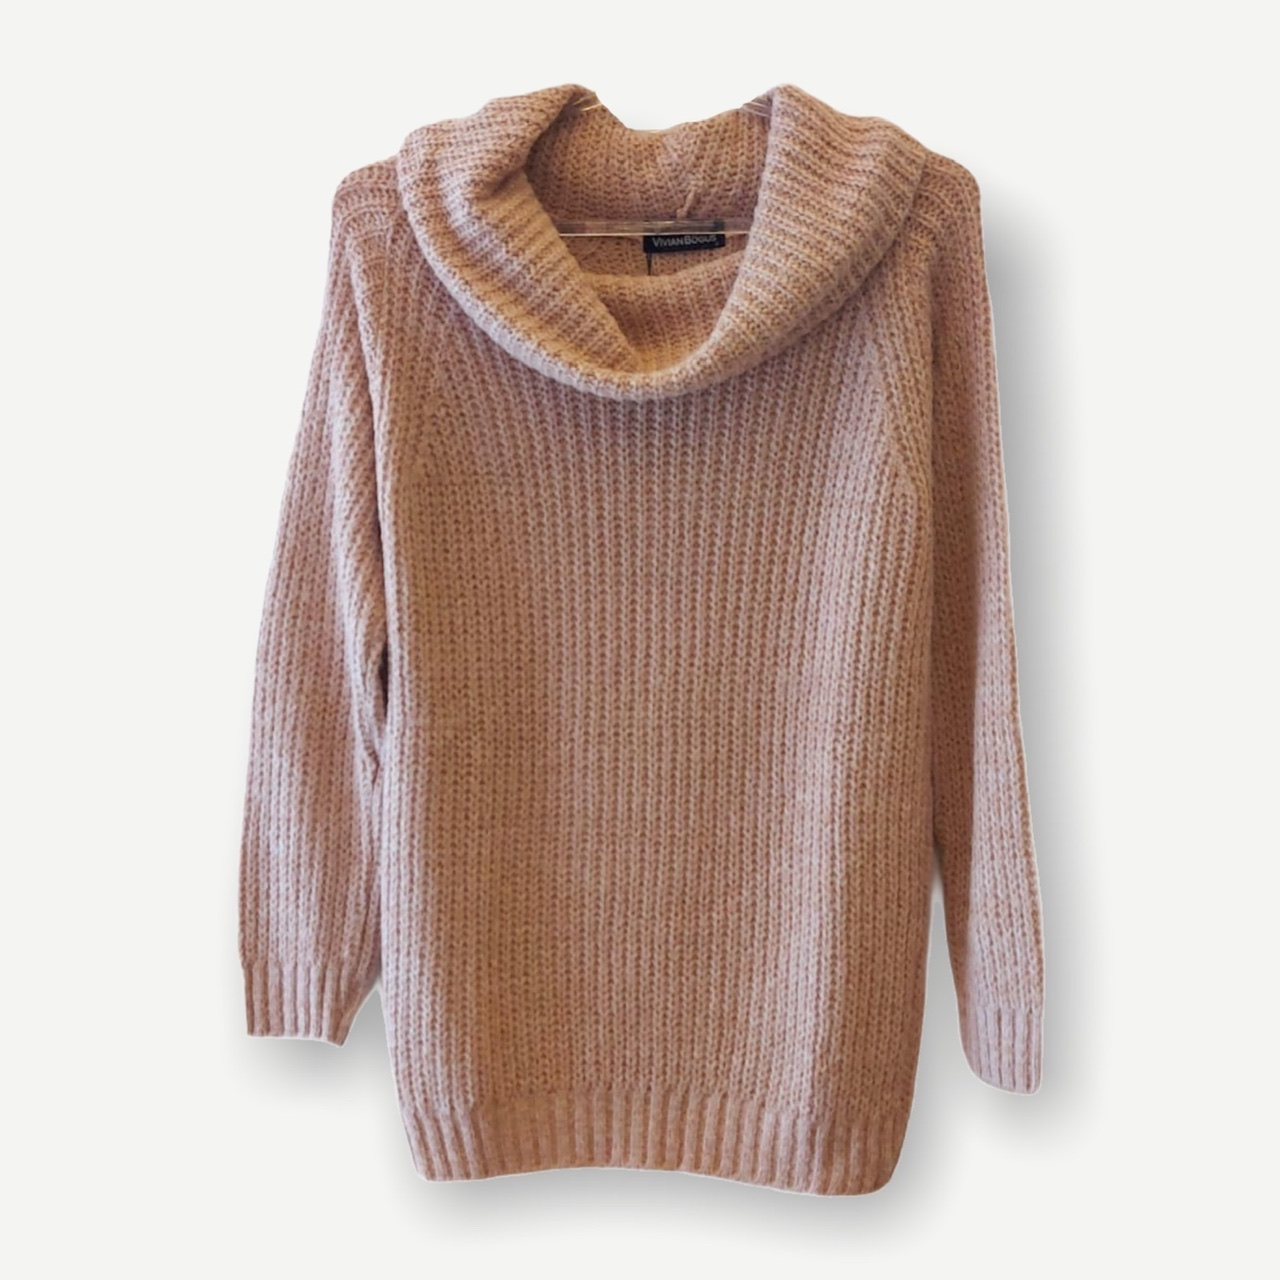 Max Pull Madalena em tricot  - Vivian Bógus